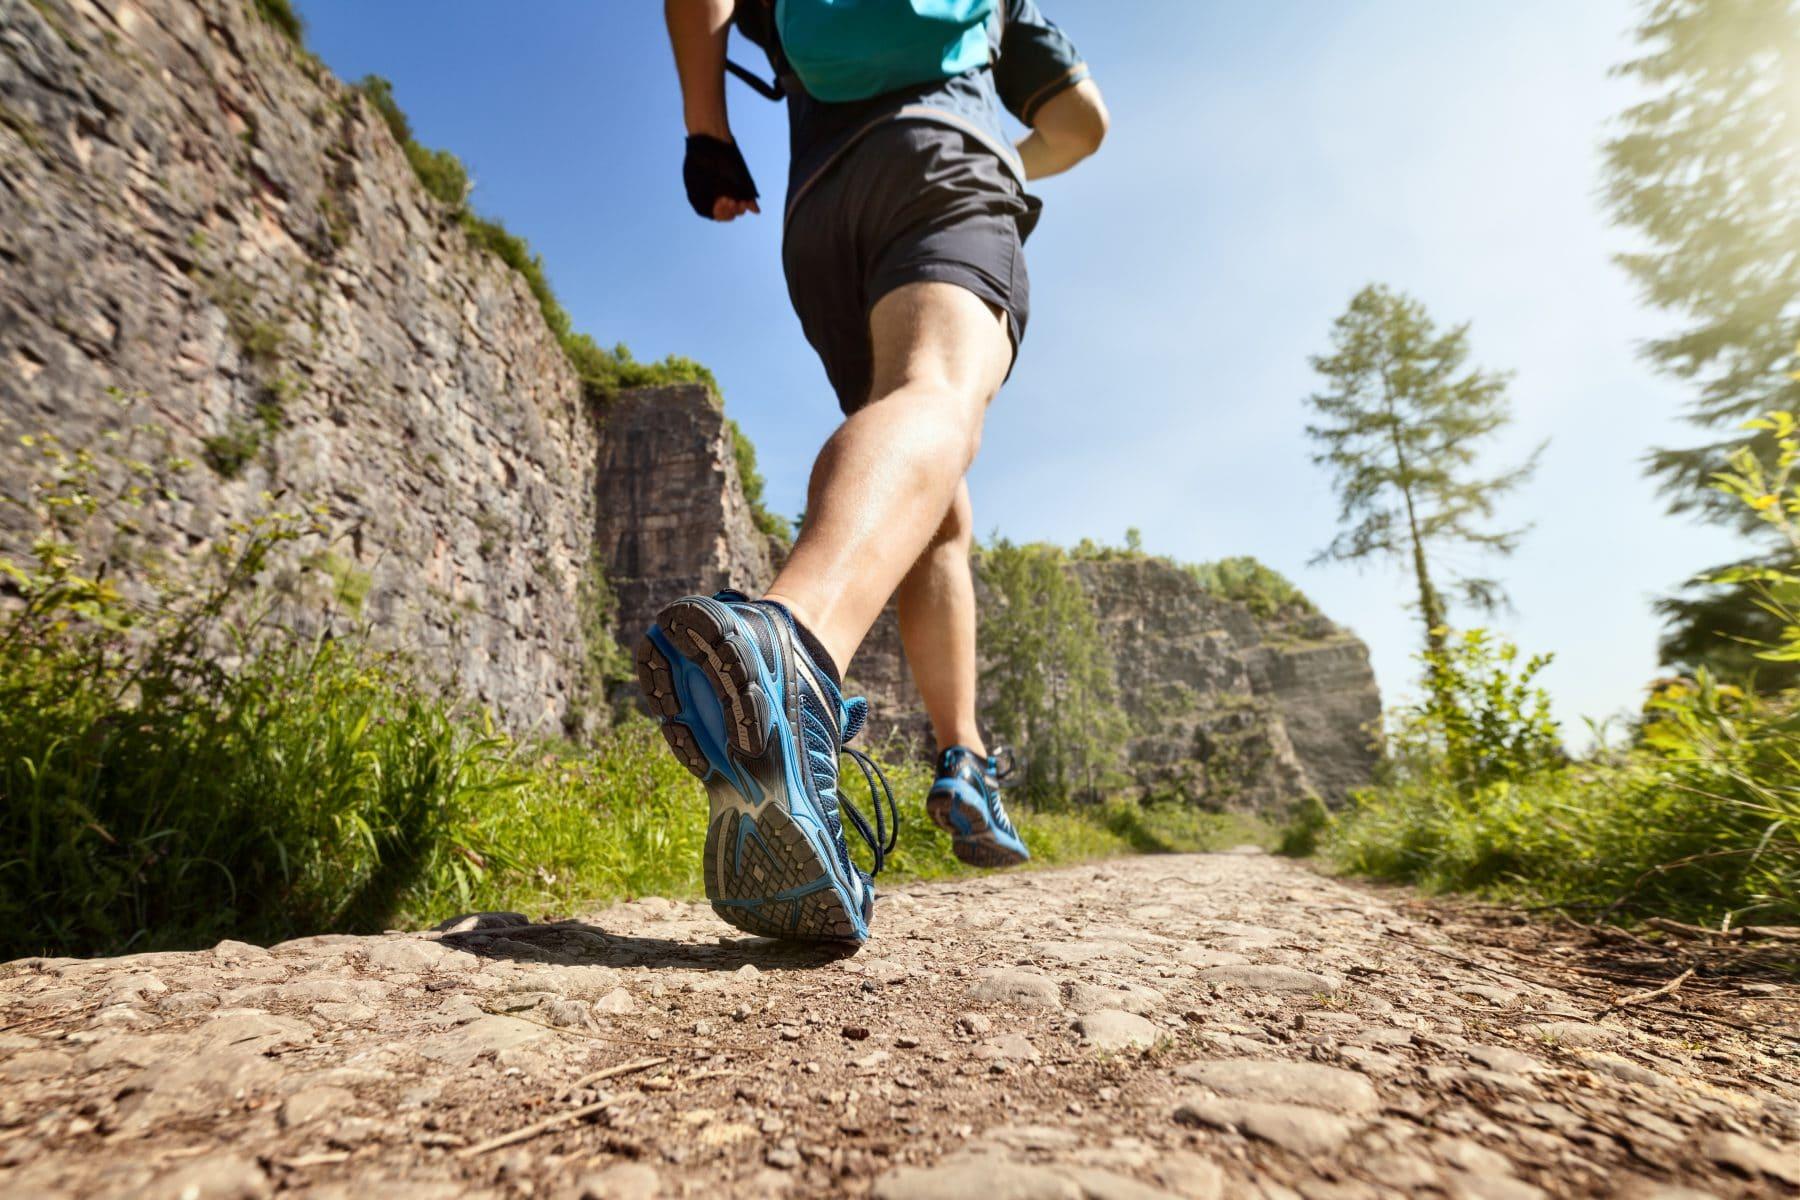 Sports Tracker running techniques